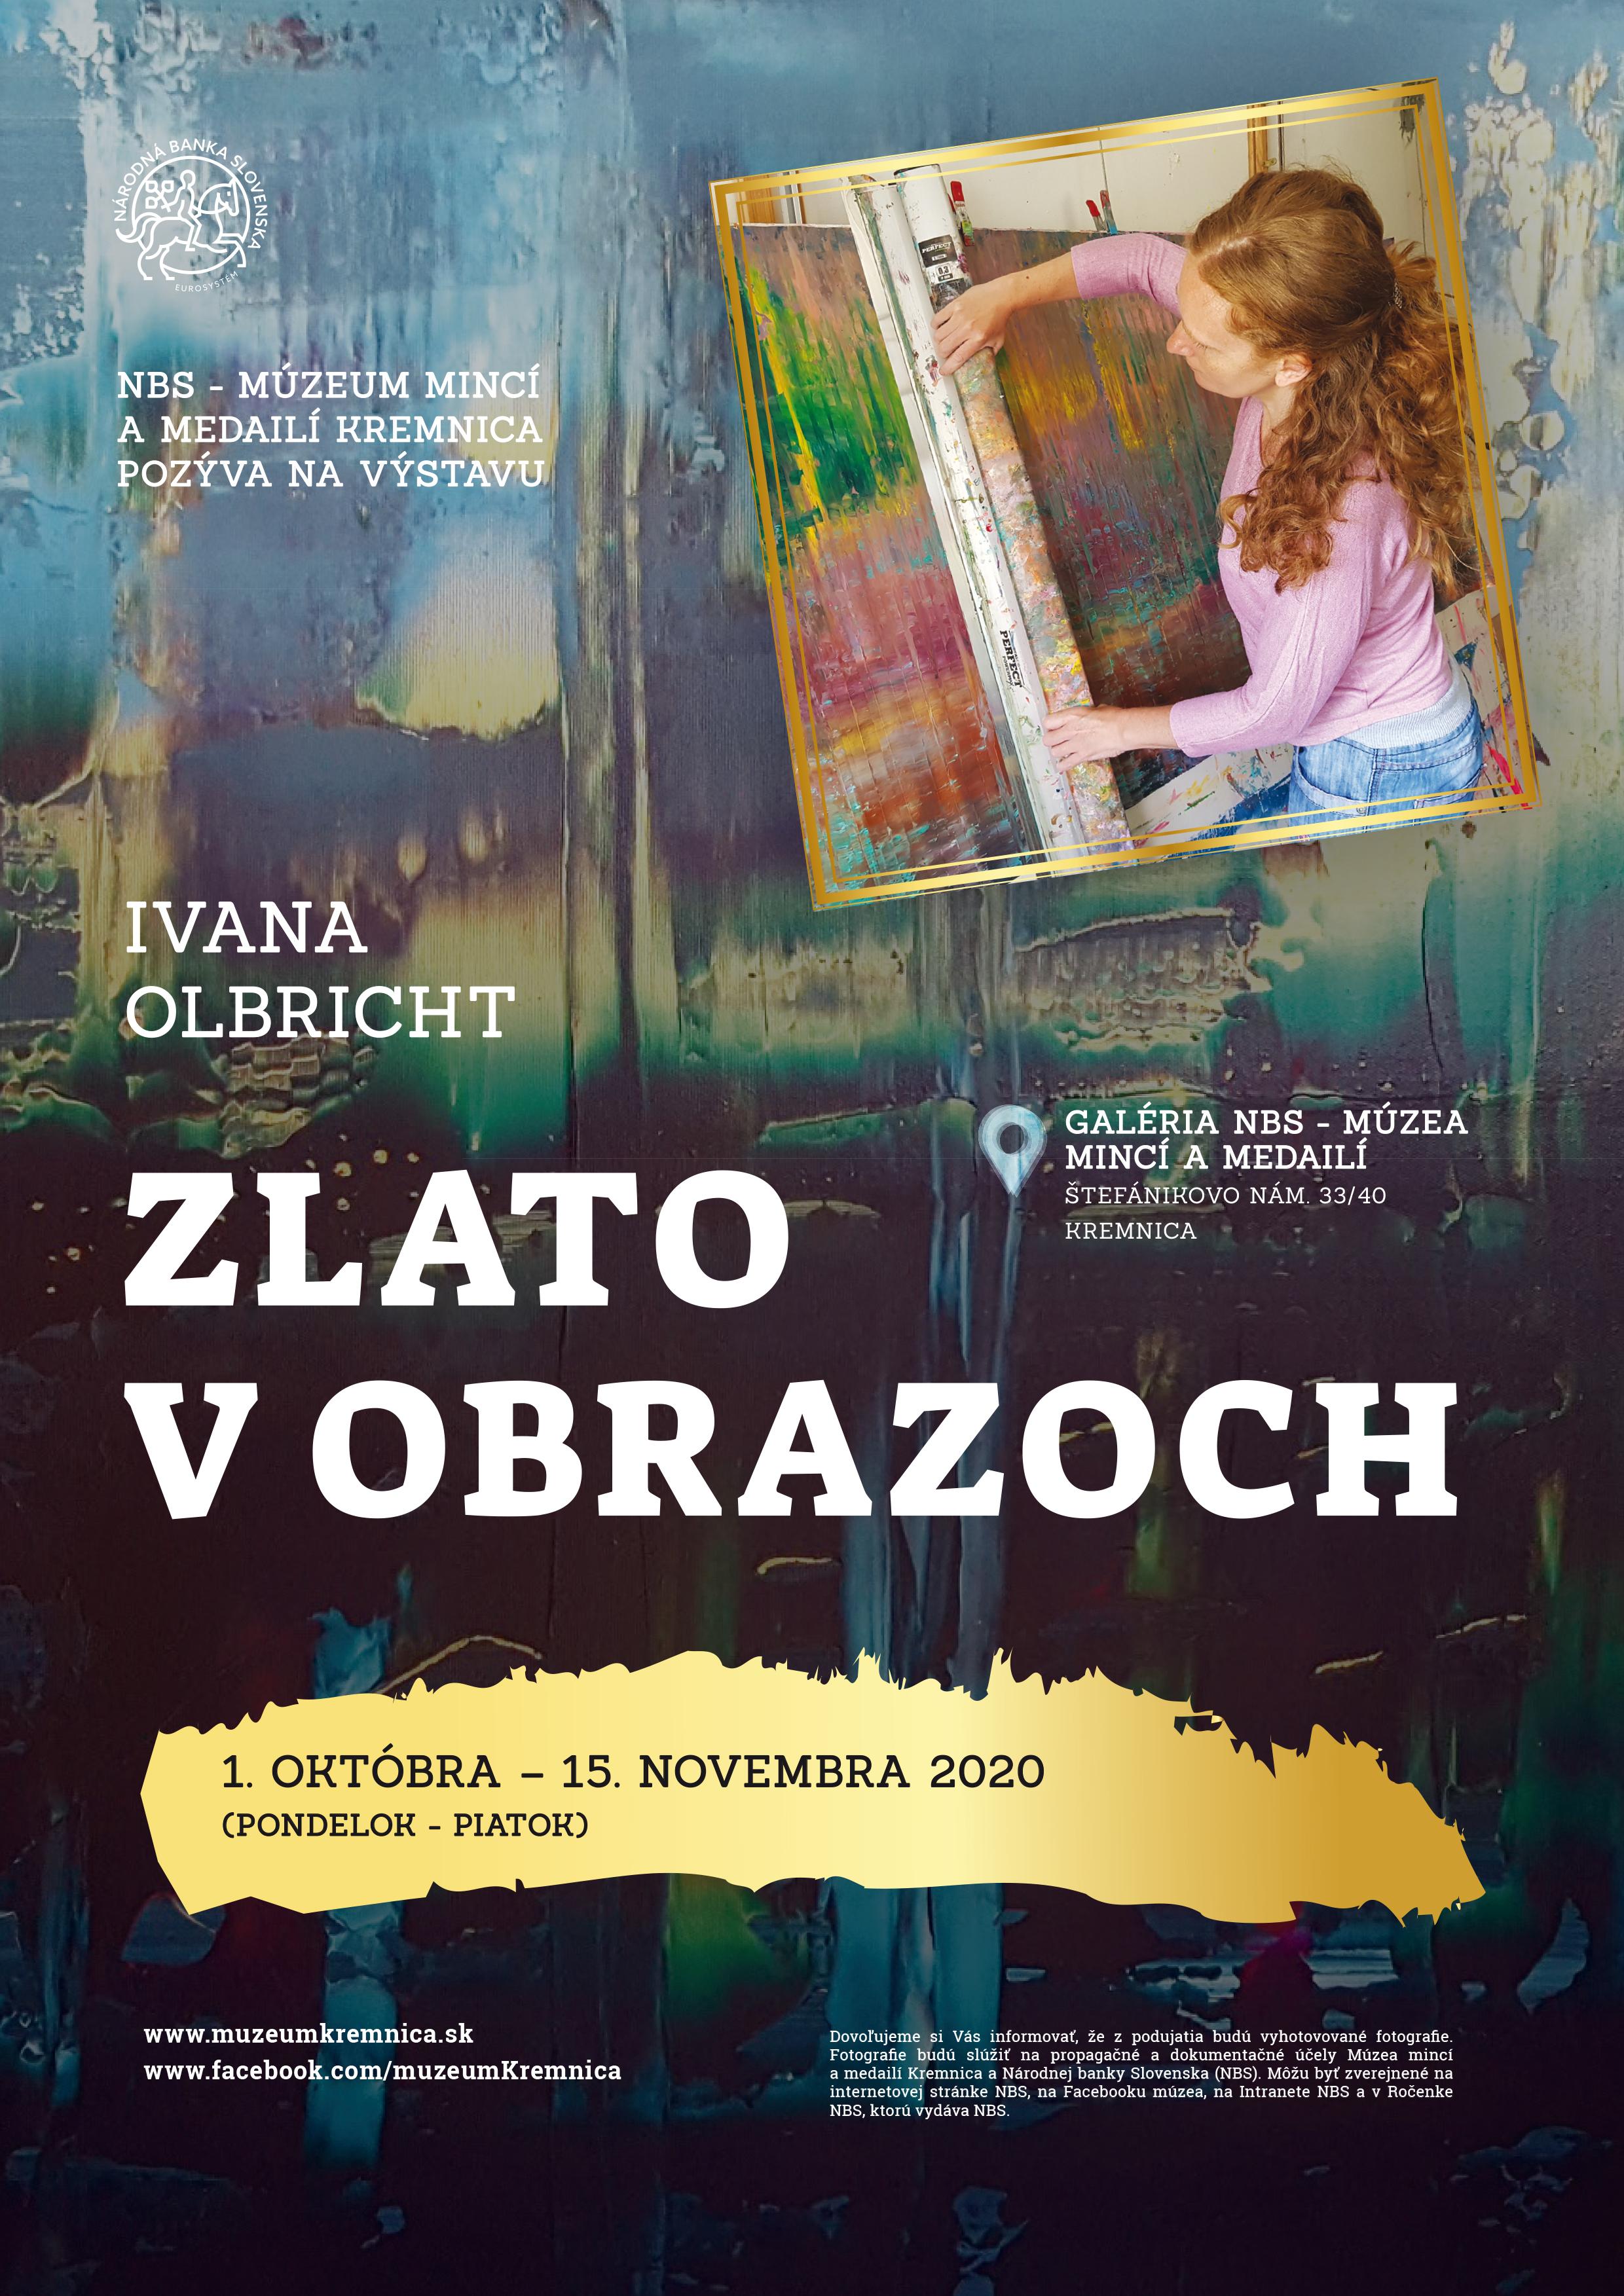 ivana olbricht, exhibtion, abstract art, art gallery